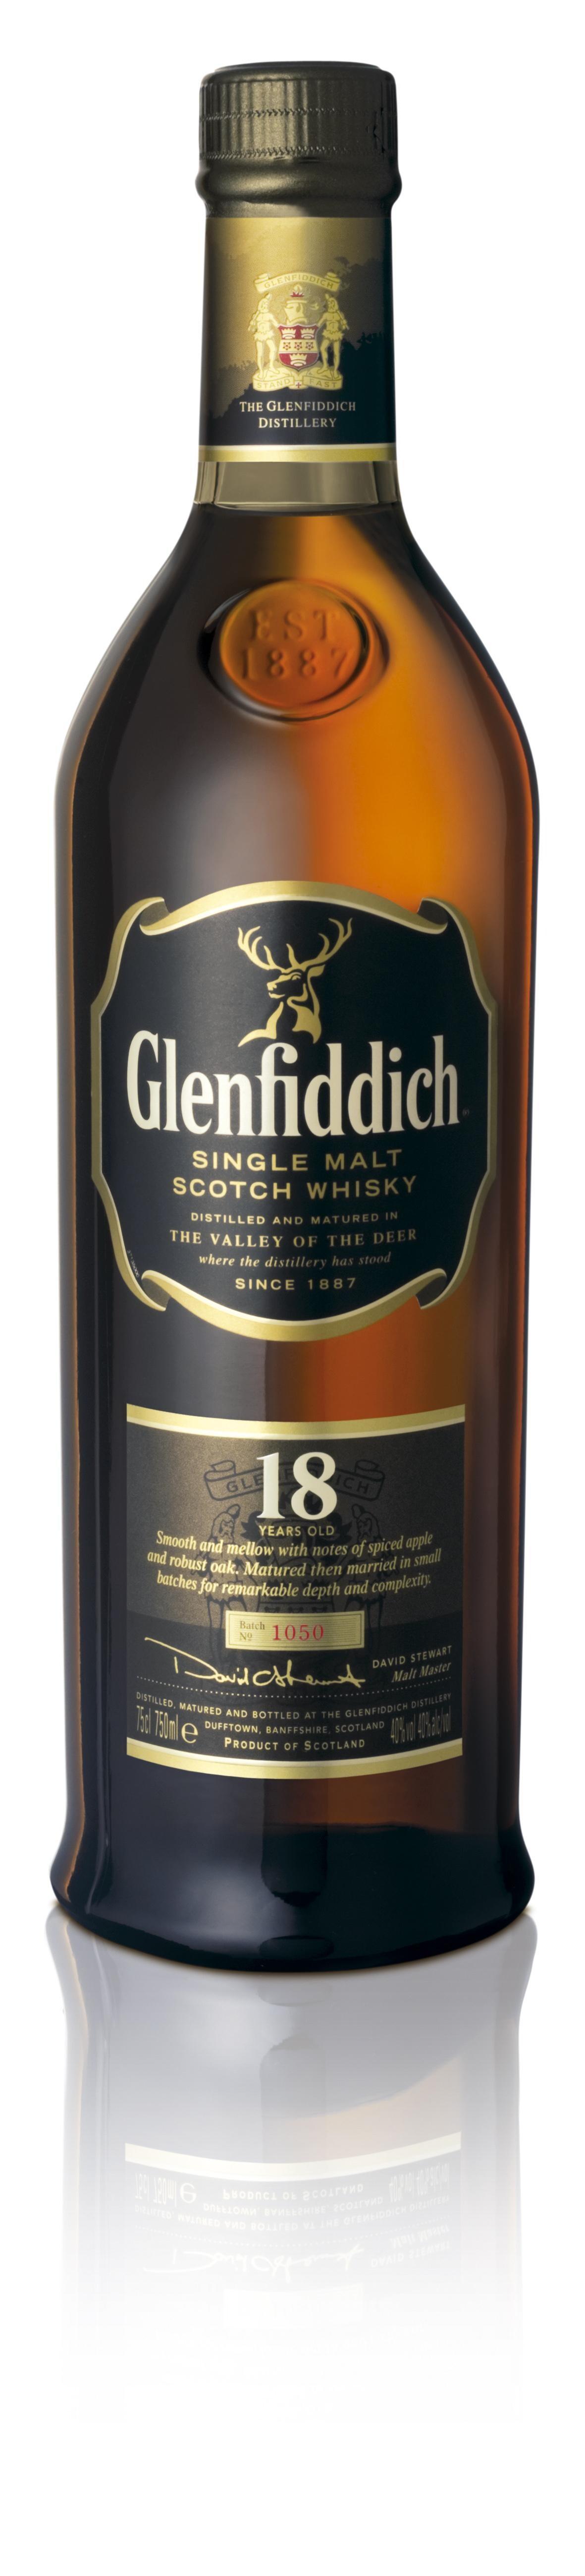 Glenfiddich 18 Years Old 70cl 40% Speyside Single Malt Scotch Whisky